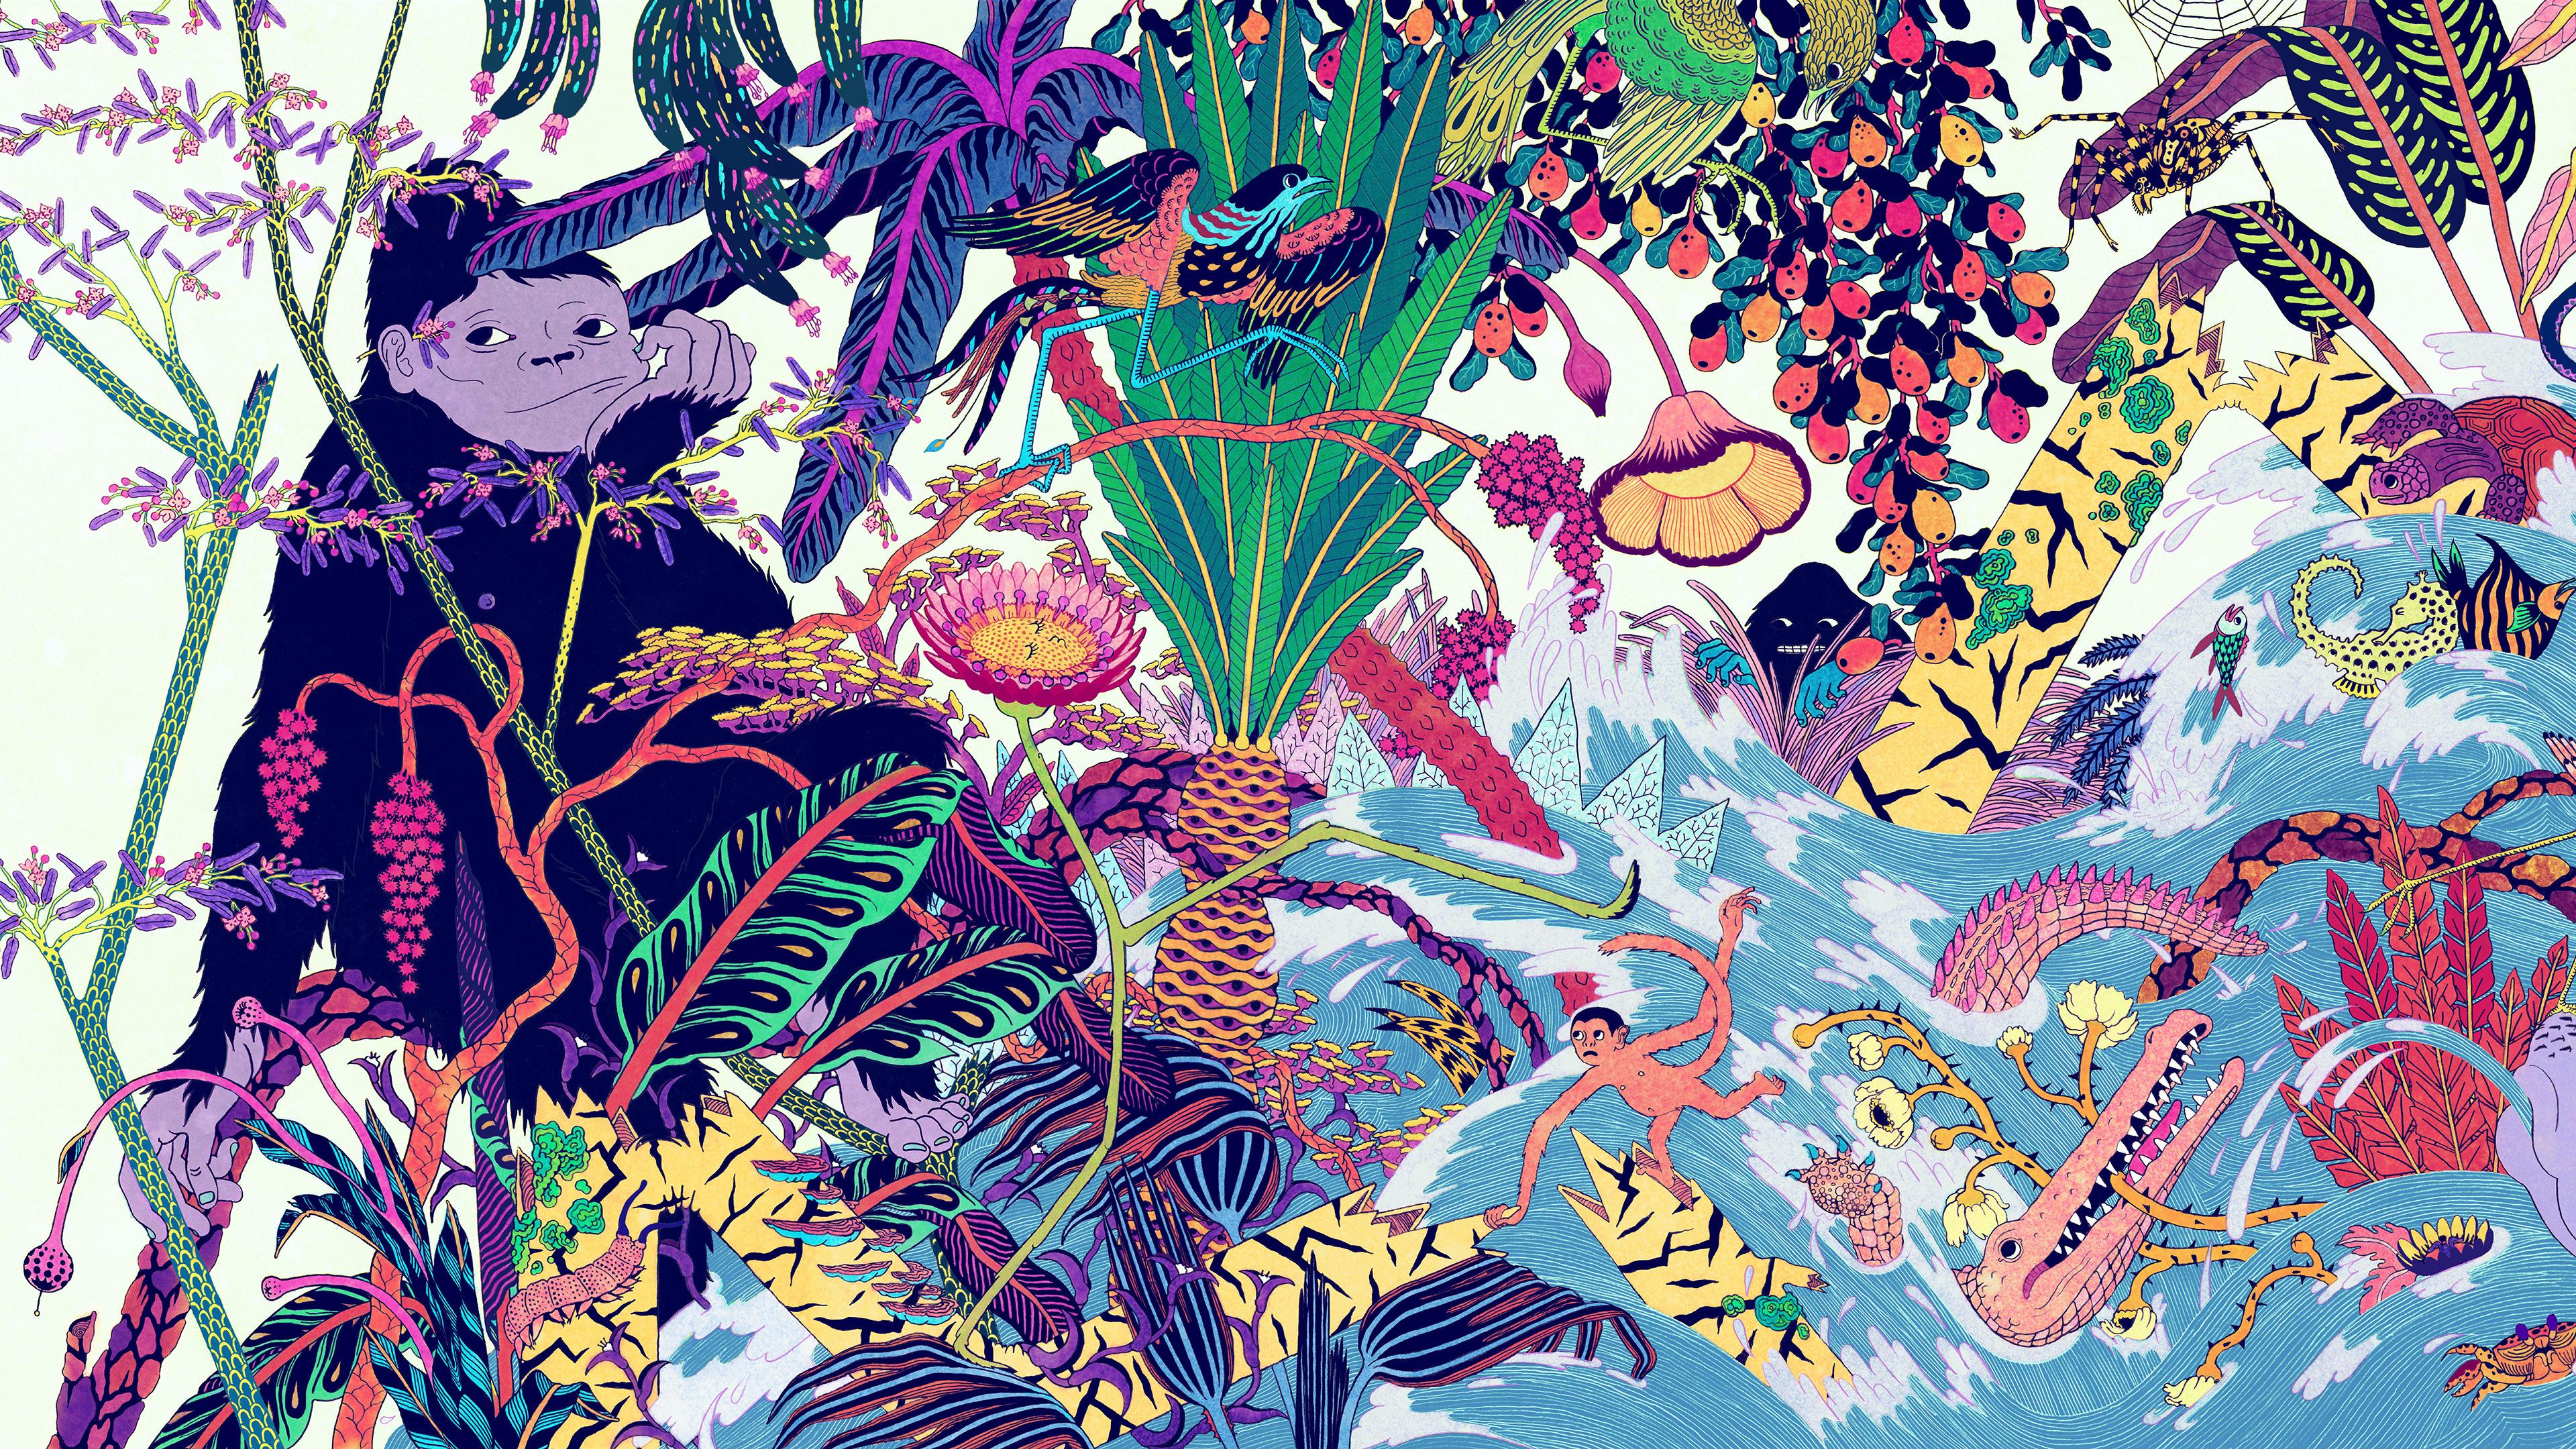 Illustration by Micah Lidberg